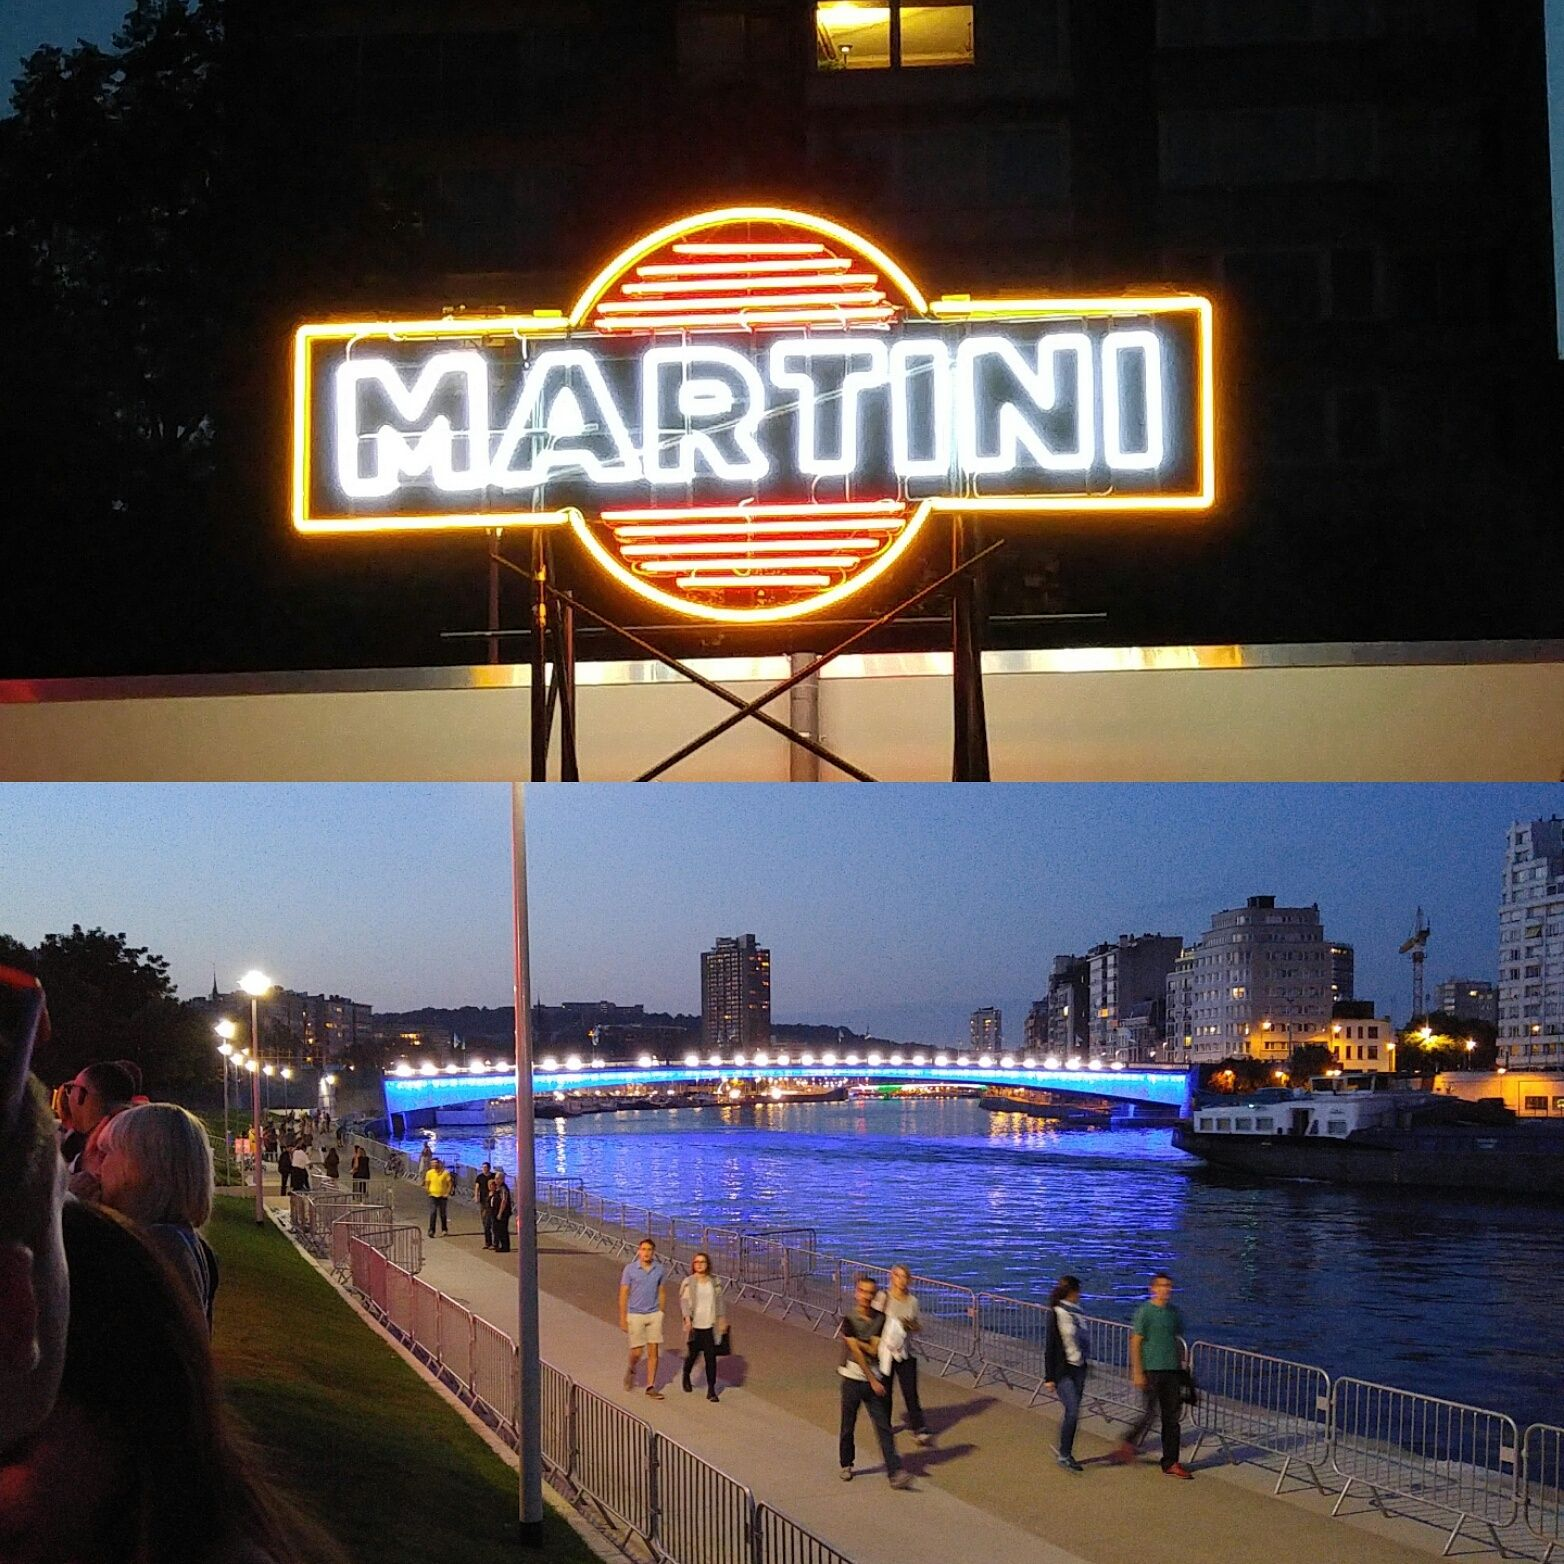 Terrazza Martini. Héliport. Liège. 2015. | Martini | Pinterest ...